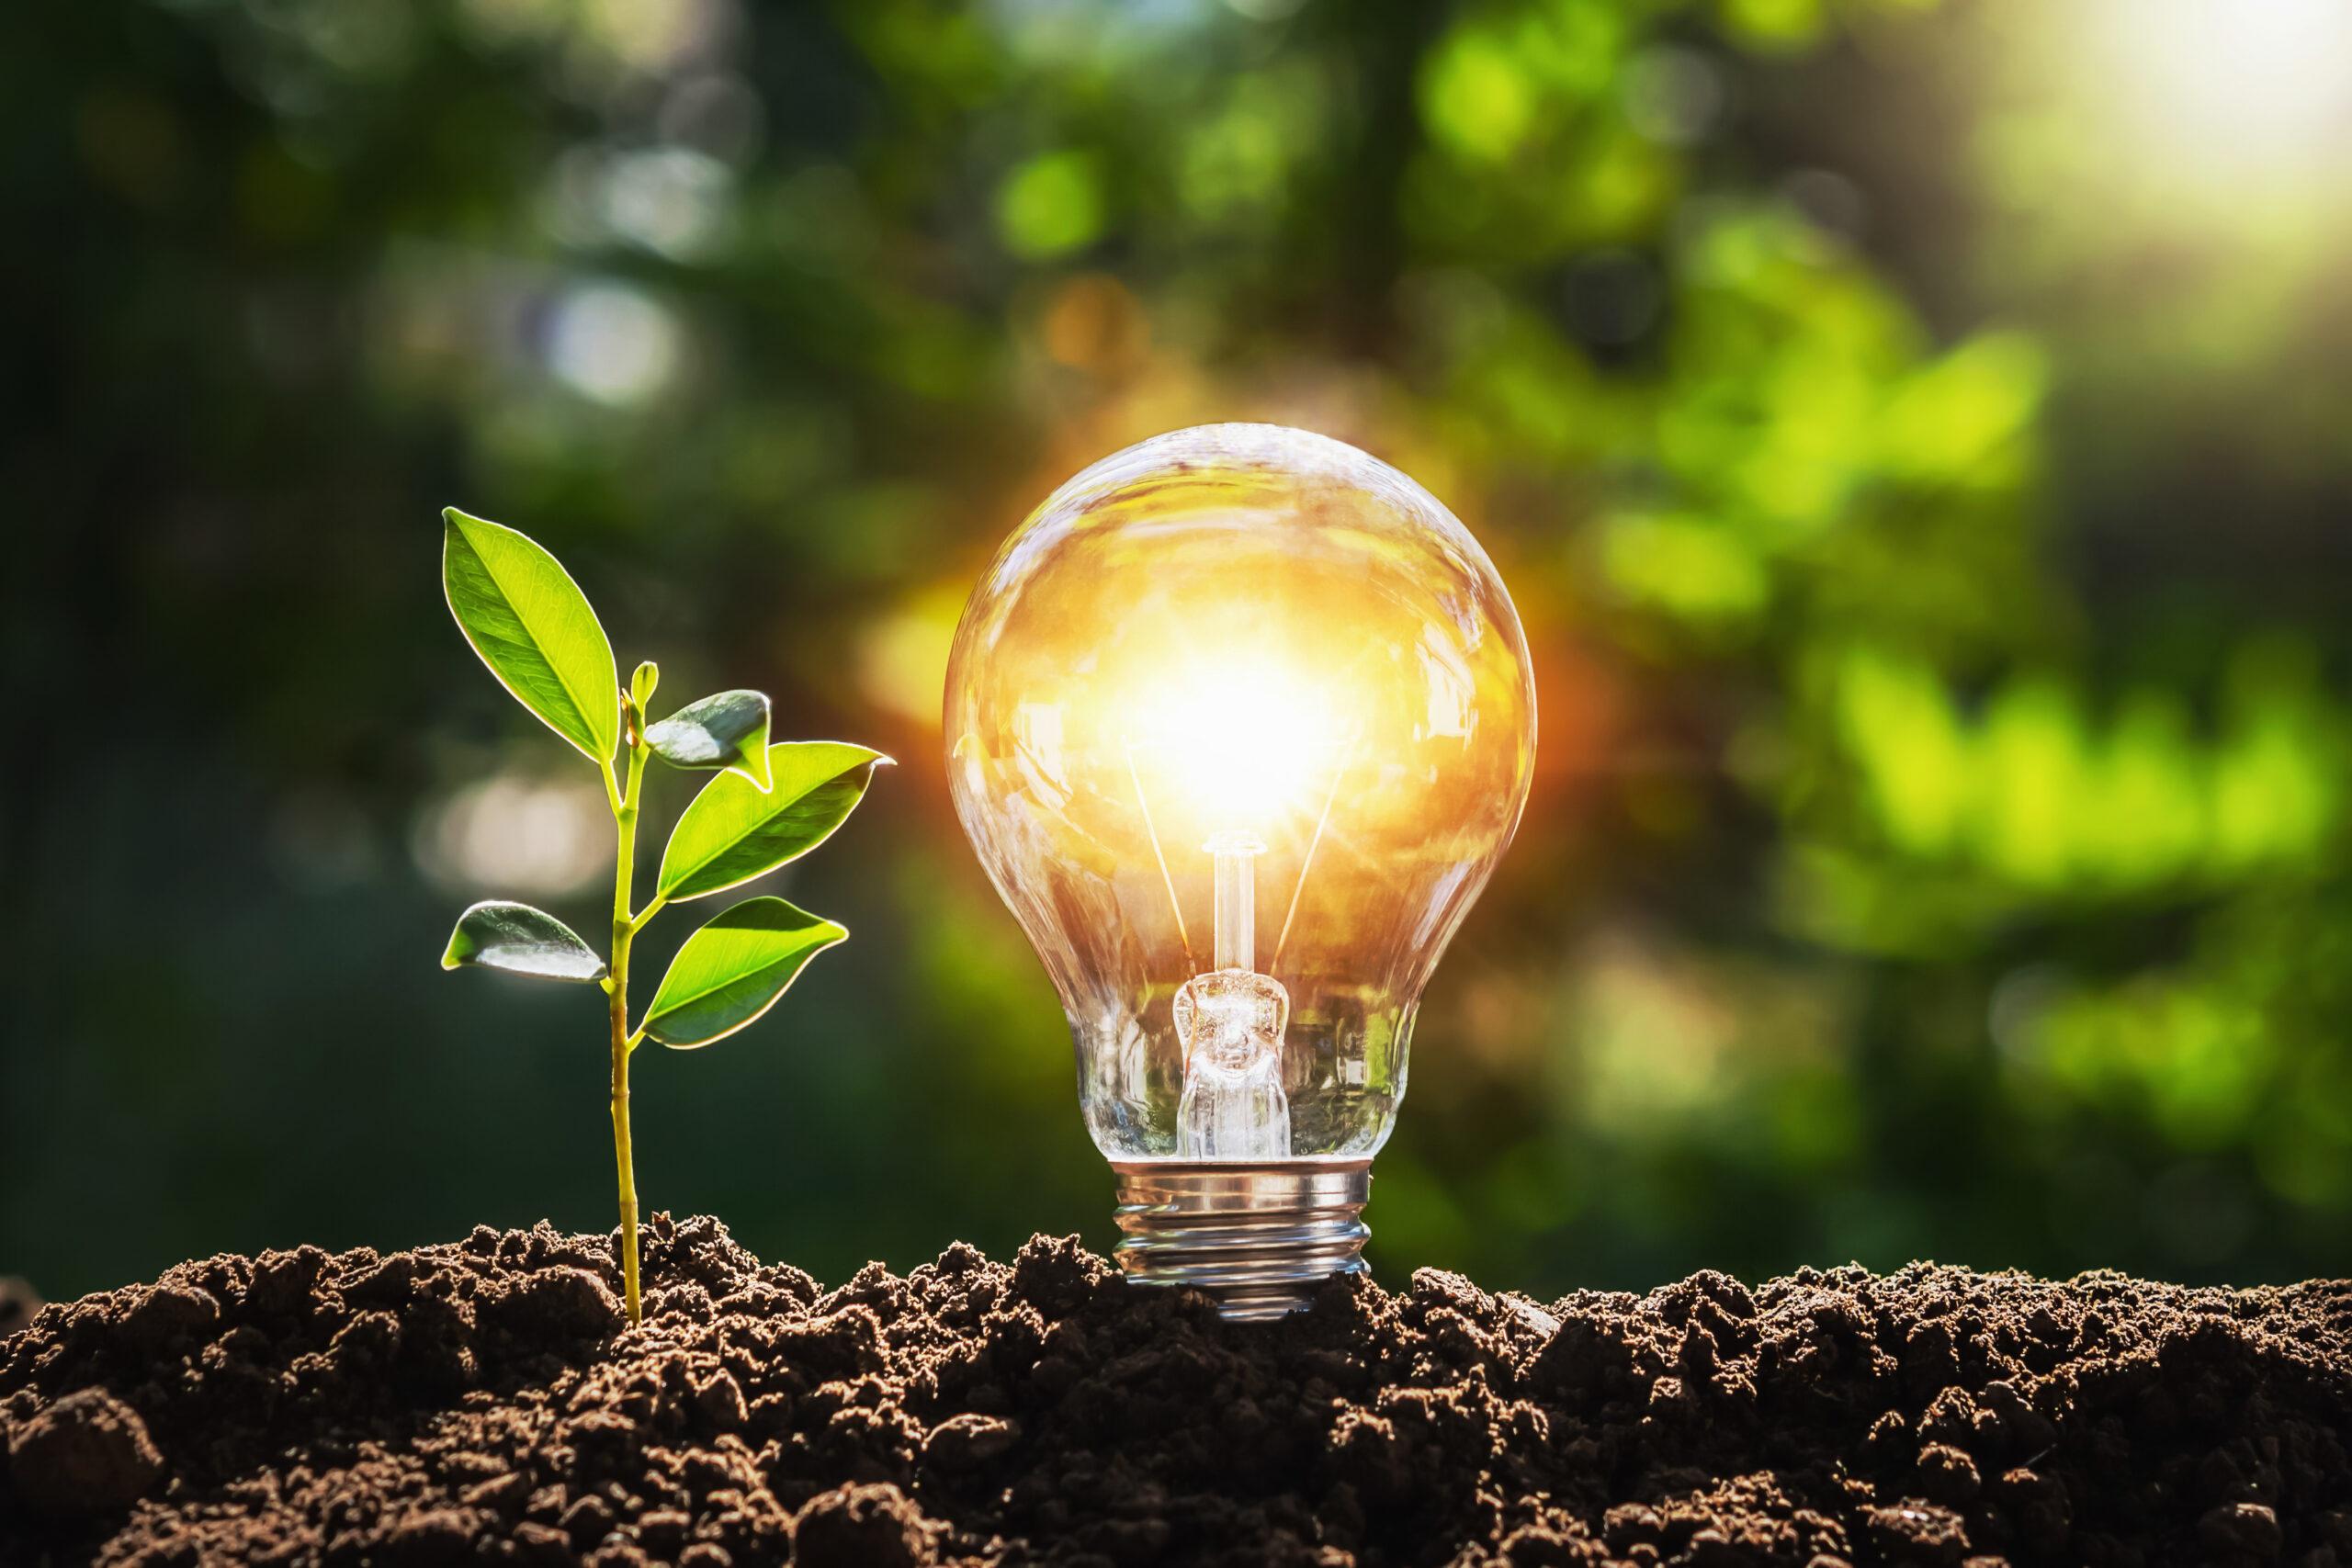 a-energia-solar-alia-sustentabilidade-e-transformacao-social-no-brasil